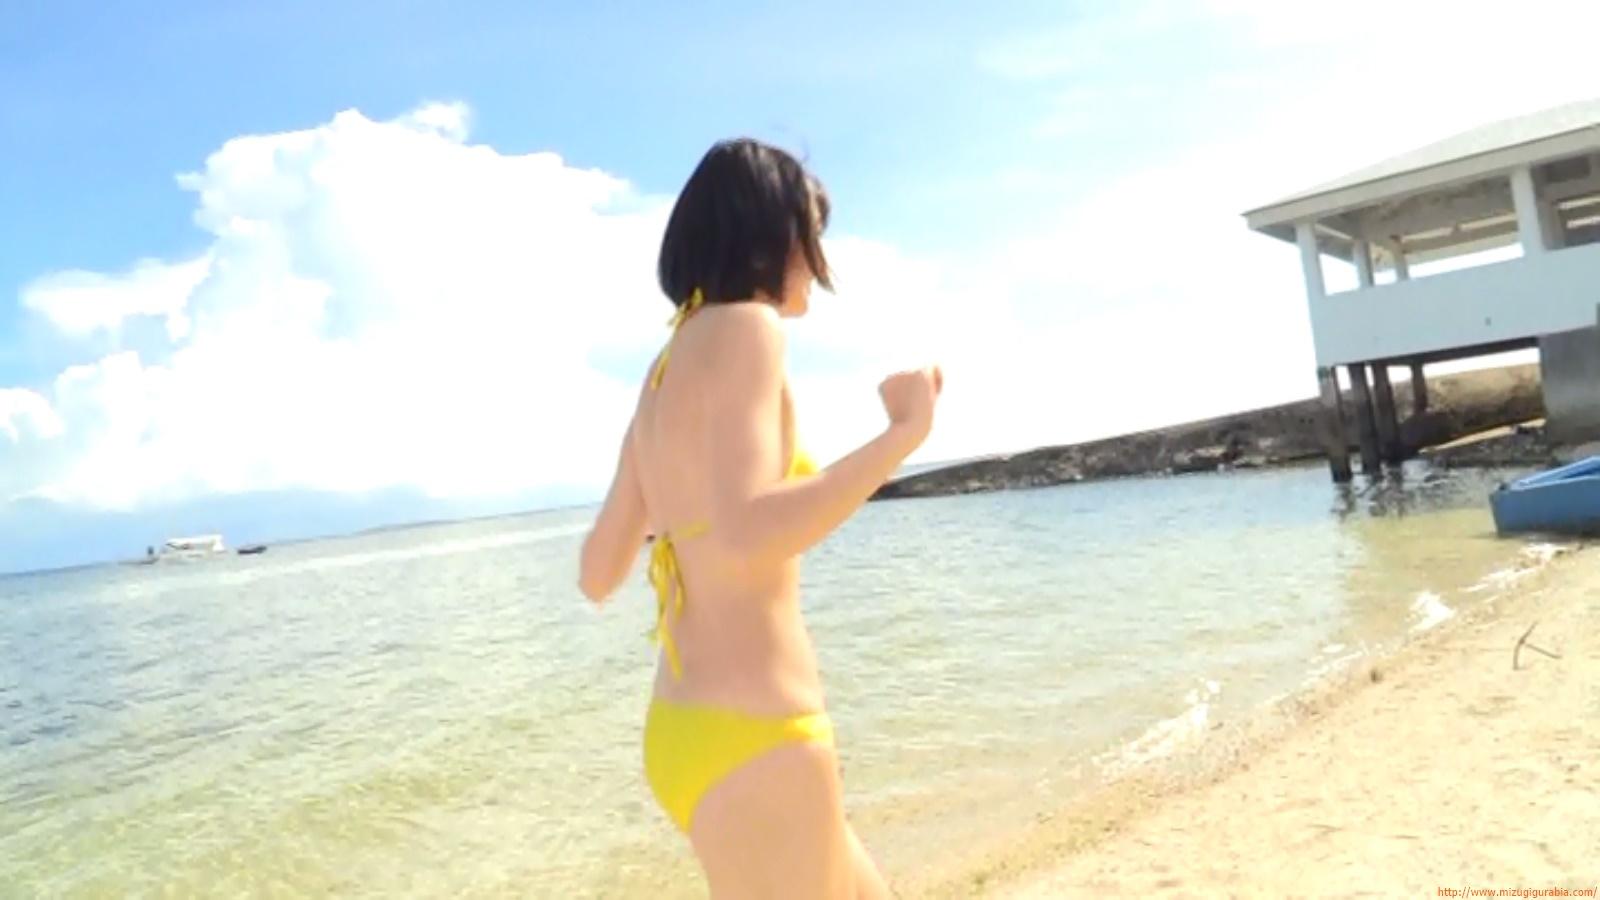 Beach dating154